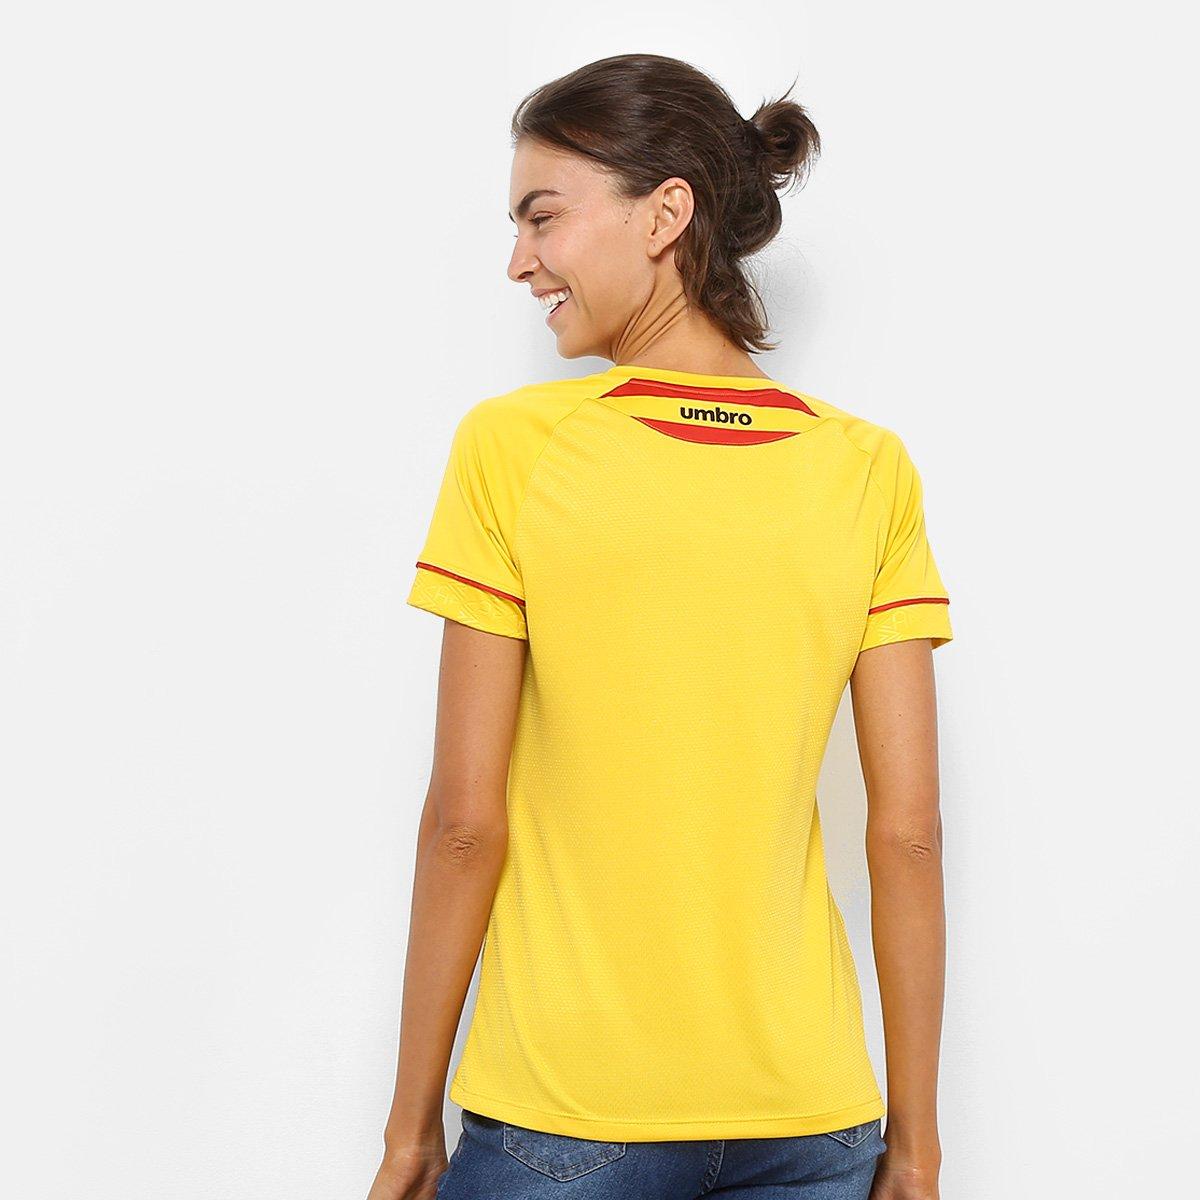 n° El PR Vermelho II Amarelo s Umbro Feminina e Torcedor Huracán Atlético 2018 Camisa qw6HxFAXX